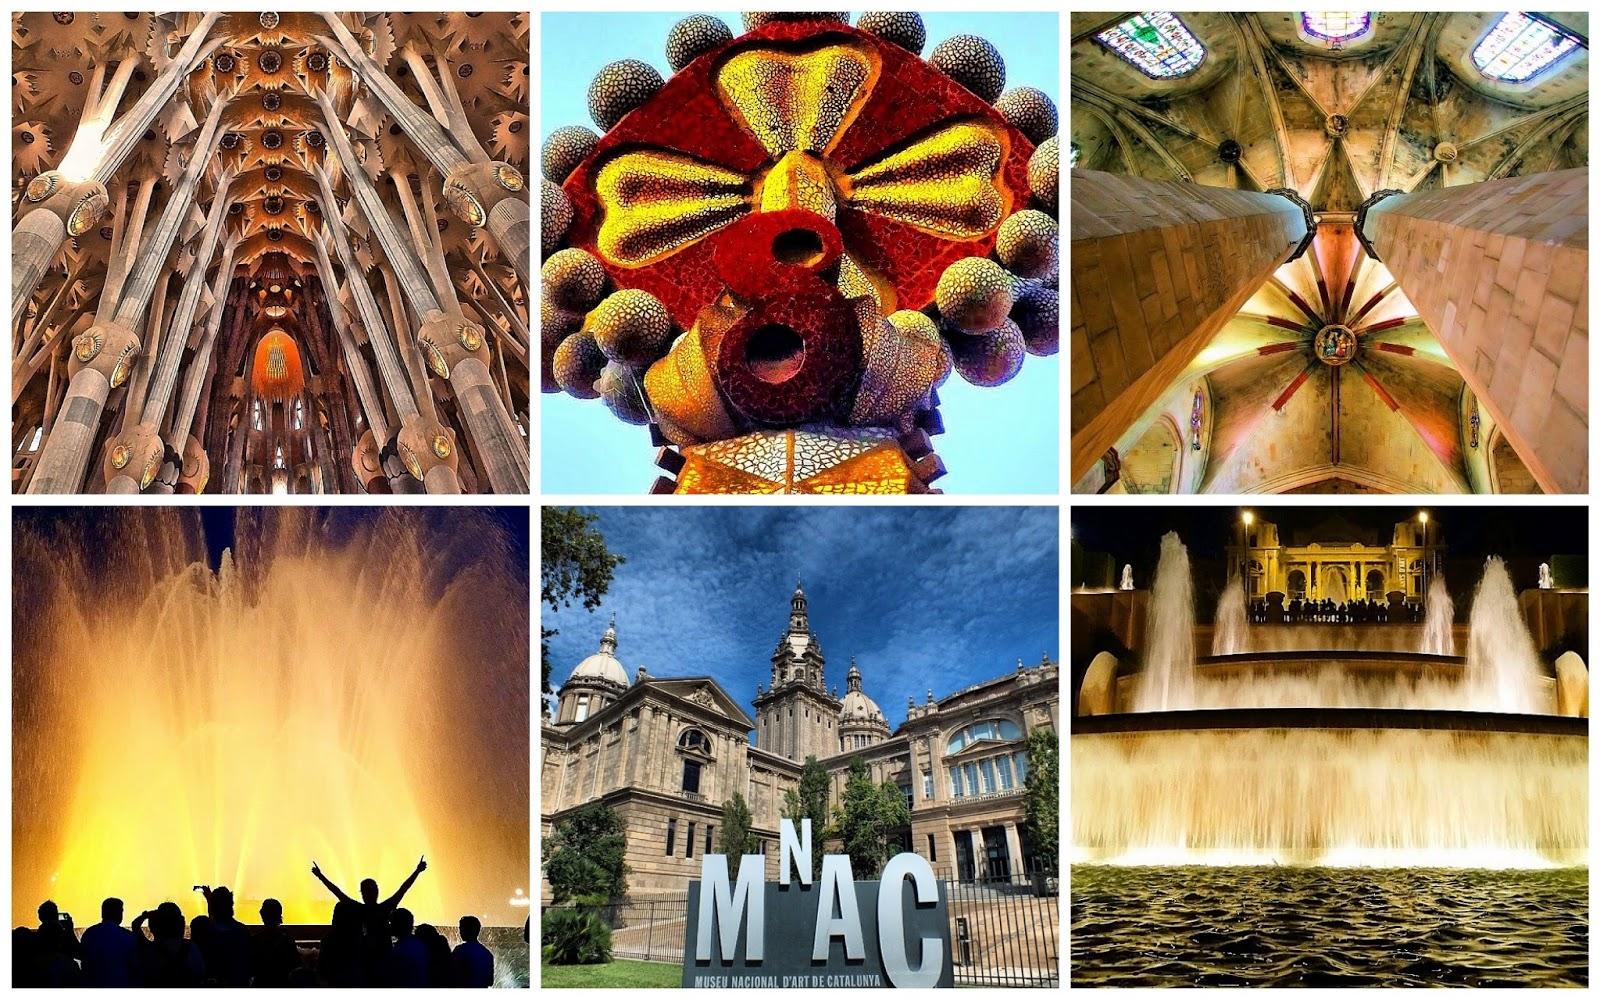 barcelona sagrada familia fotografias artista fuente mágica bcn museo nacional arte cataluña montjuic